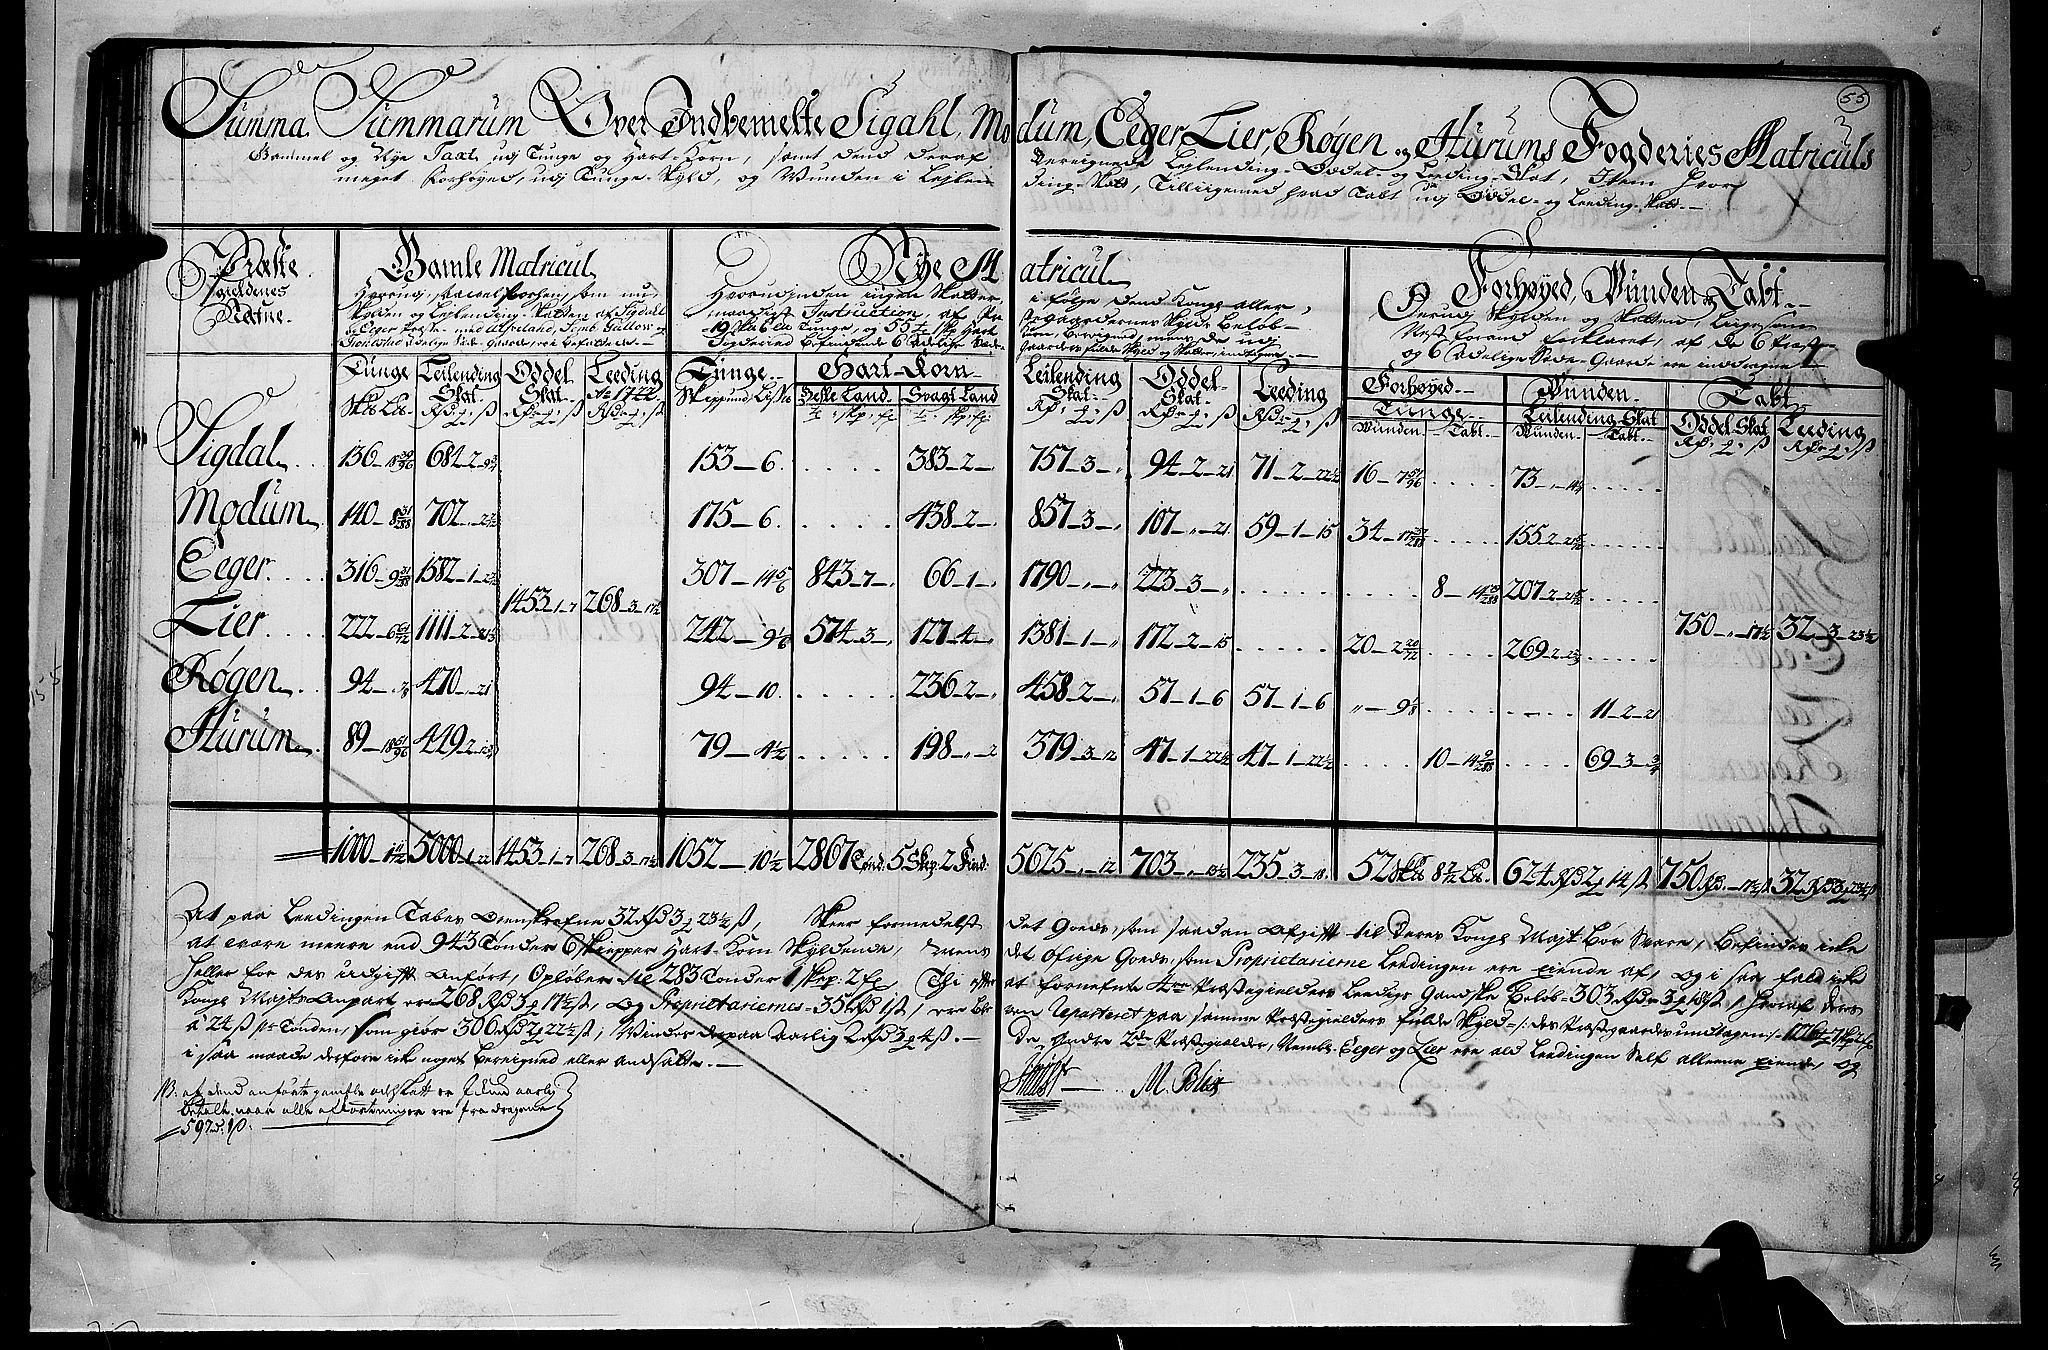 RA, Rentekammeret inntil 1814, Realistisk ordnet avdeling, N/Nb/Nbf/L0112: Buskerud matrikkelprotokoll, 1723, s. 54b-55a